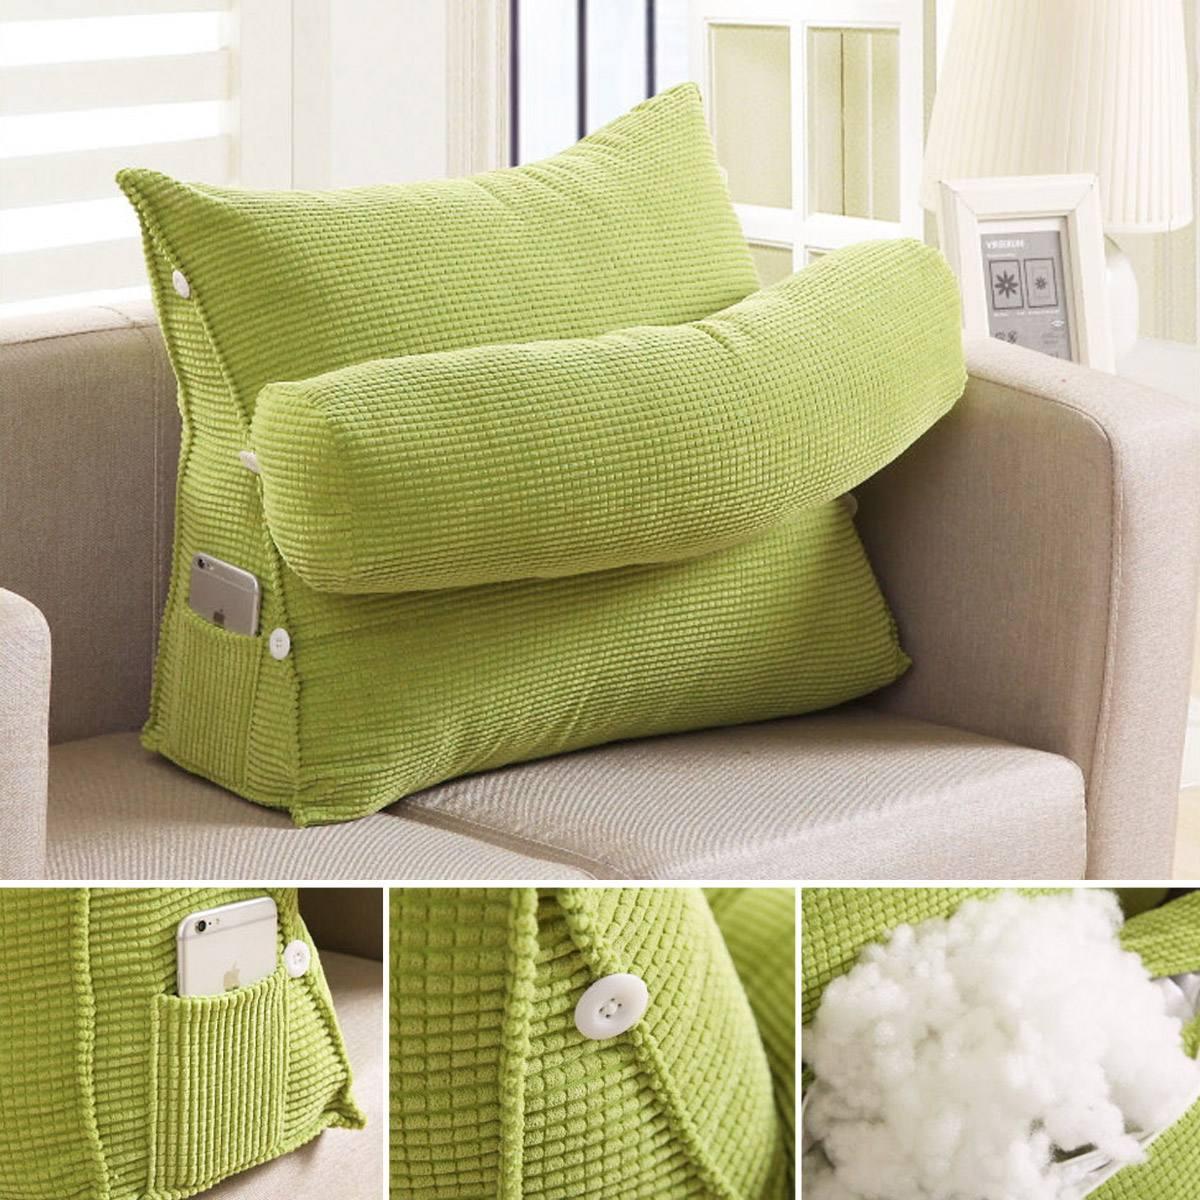 HTB1B0Z7X6DuK1Rjy1zjq6zraFXac Triangle Sofa Cushion Back Pillow Bed Backrest Office Chair Pillow Support Waist Cushion Lounger TV Reading Lumbar Home Decor